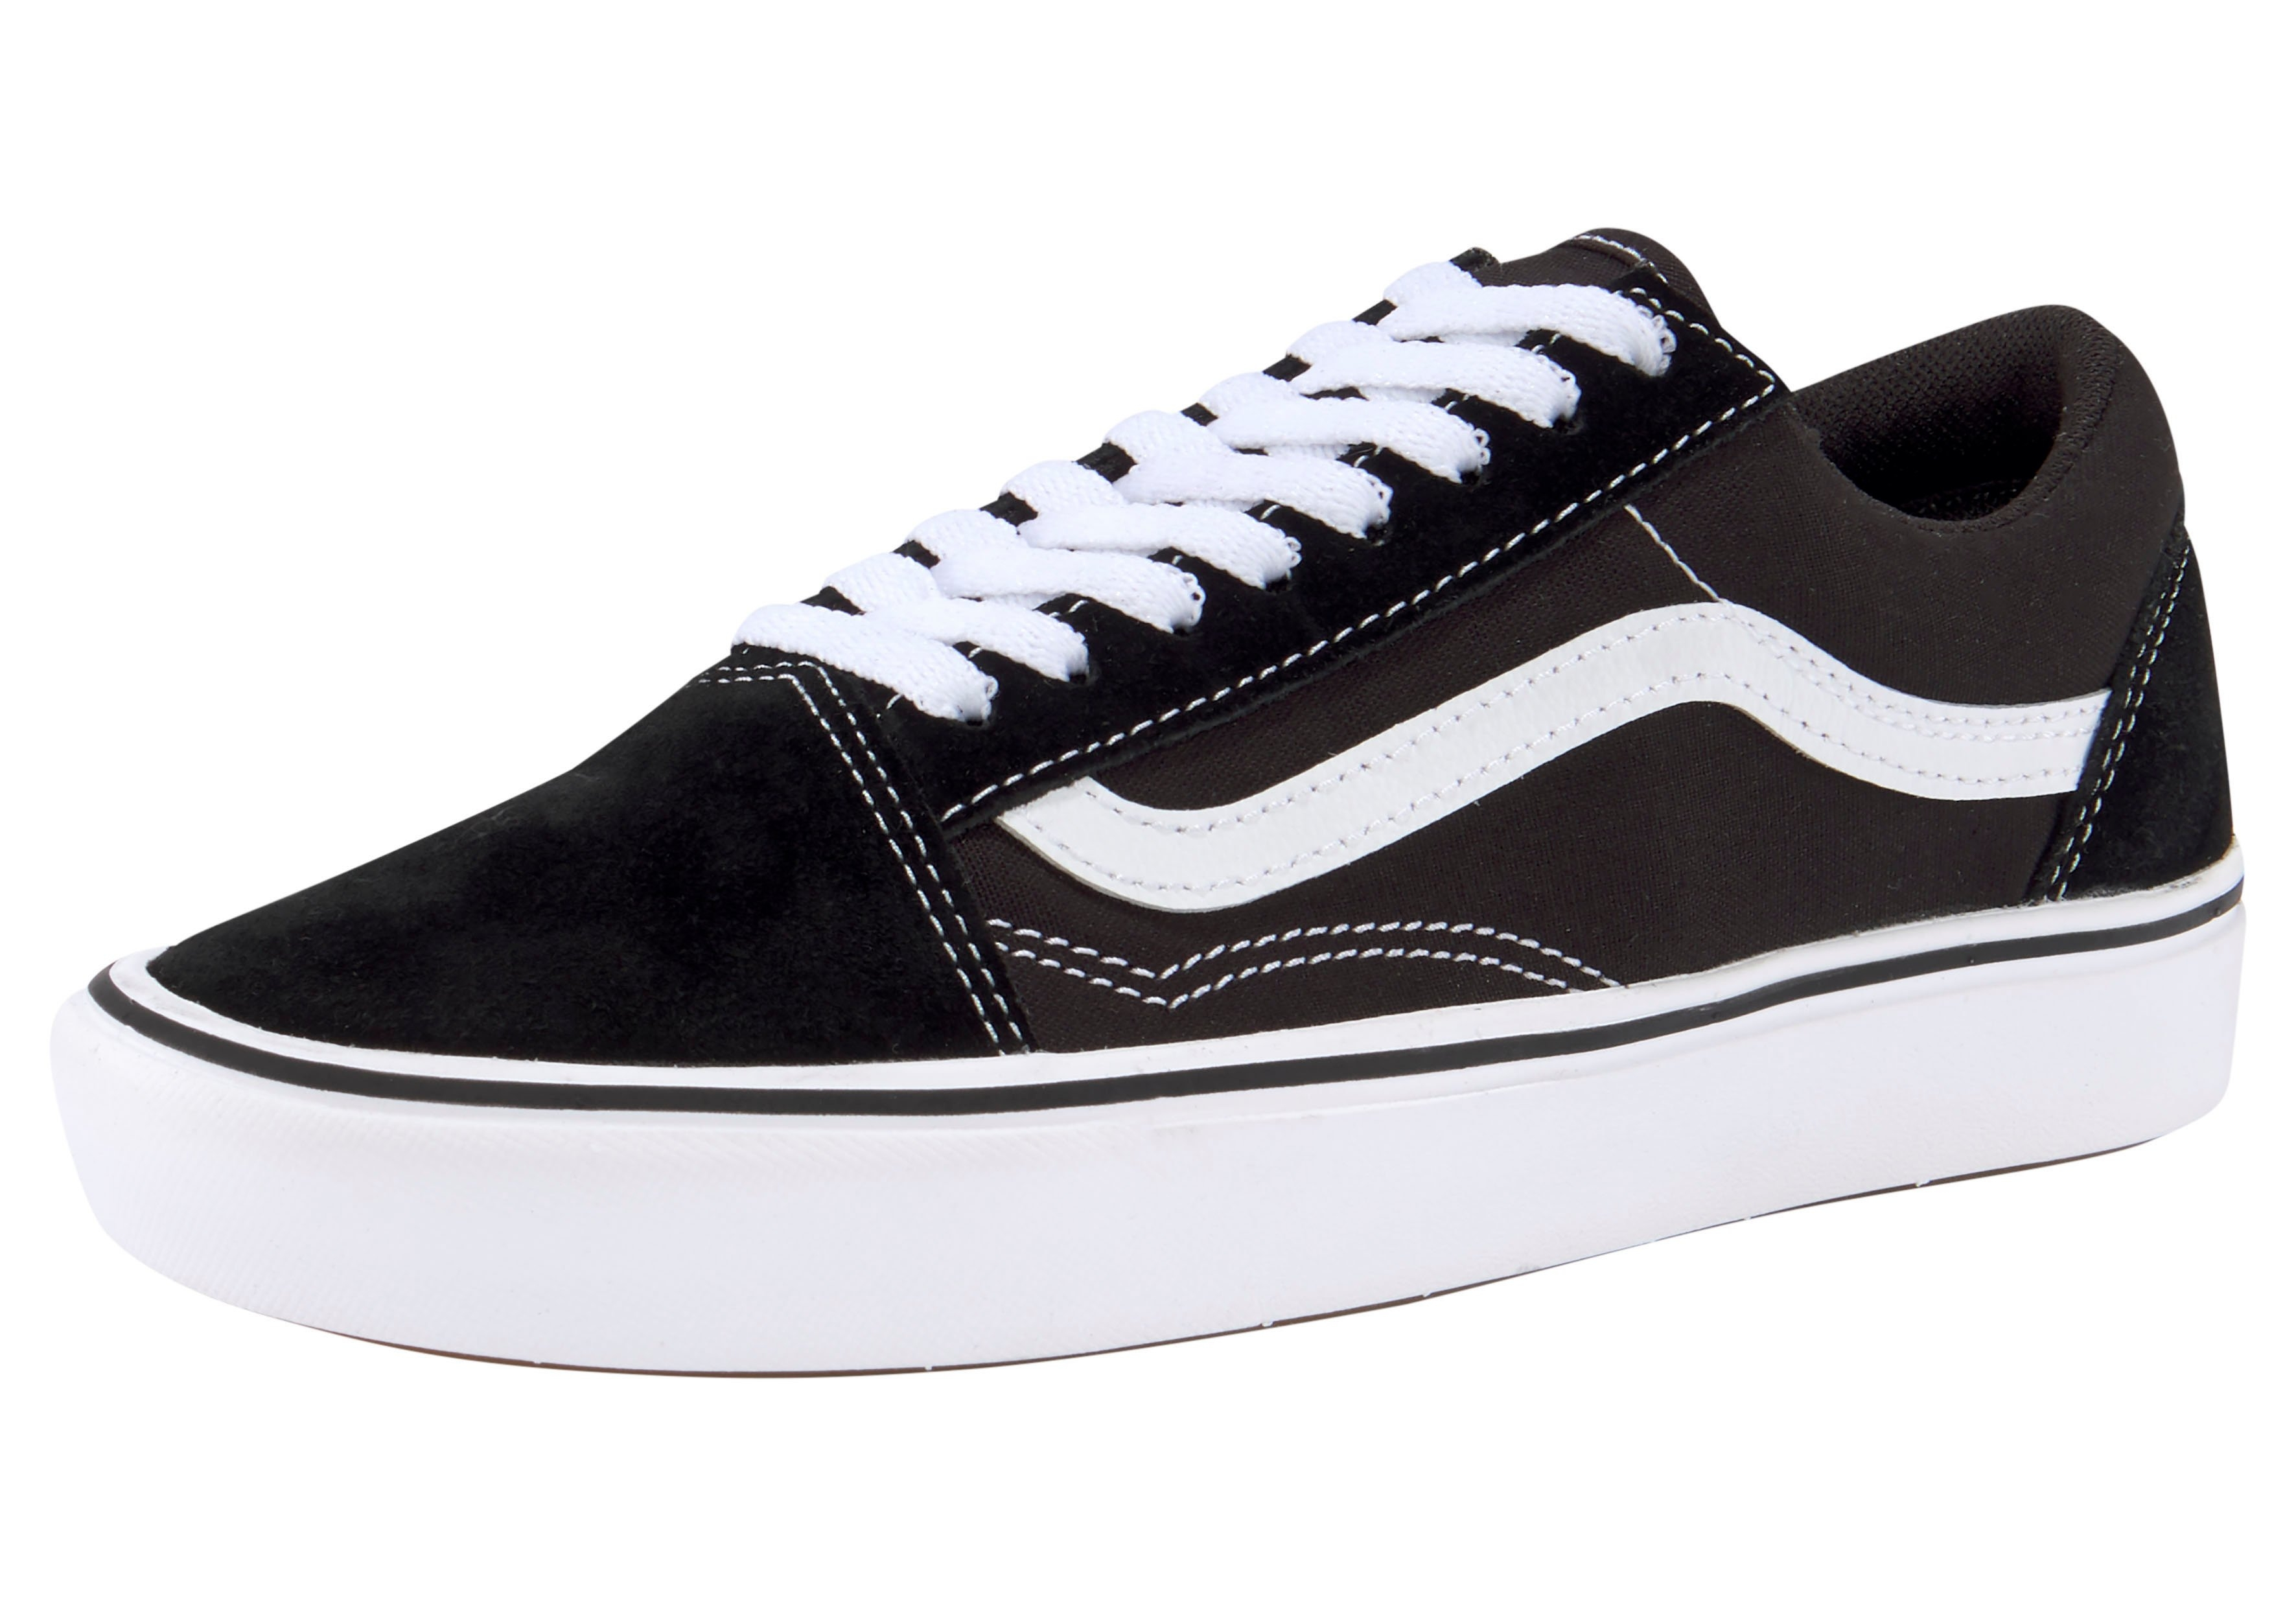 Vans sneakers Old Skool met comfycush zool goedkoop op otto.nl kopen